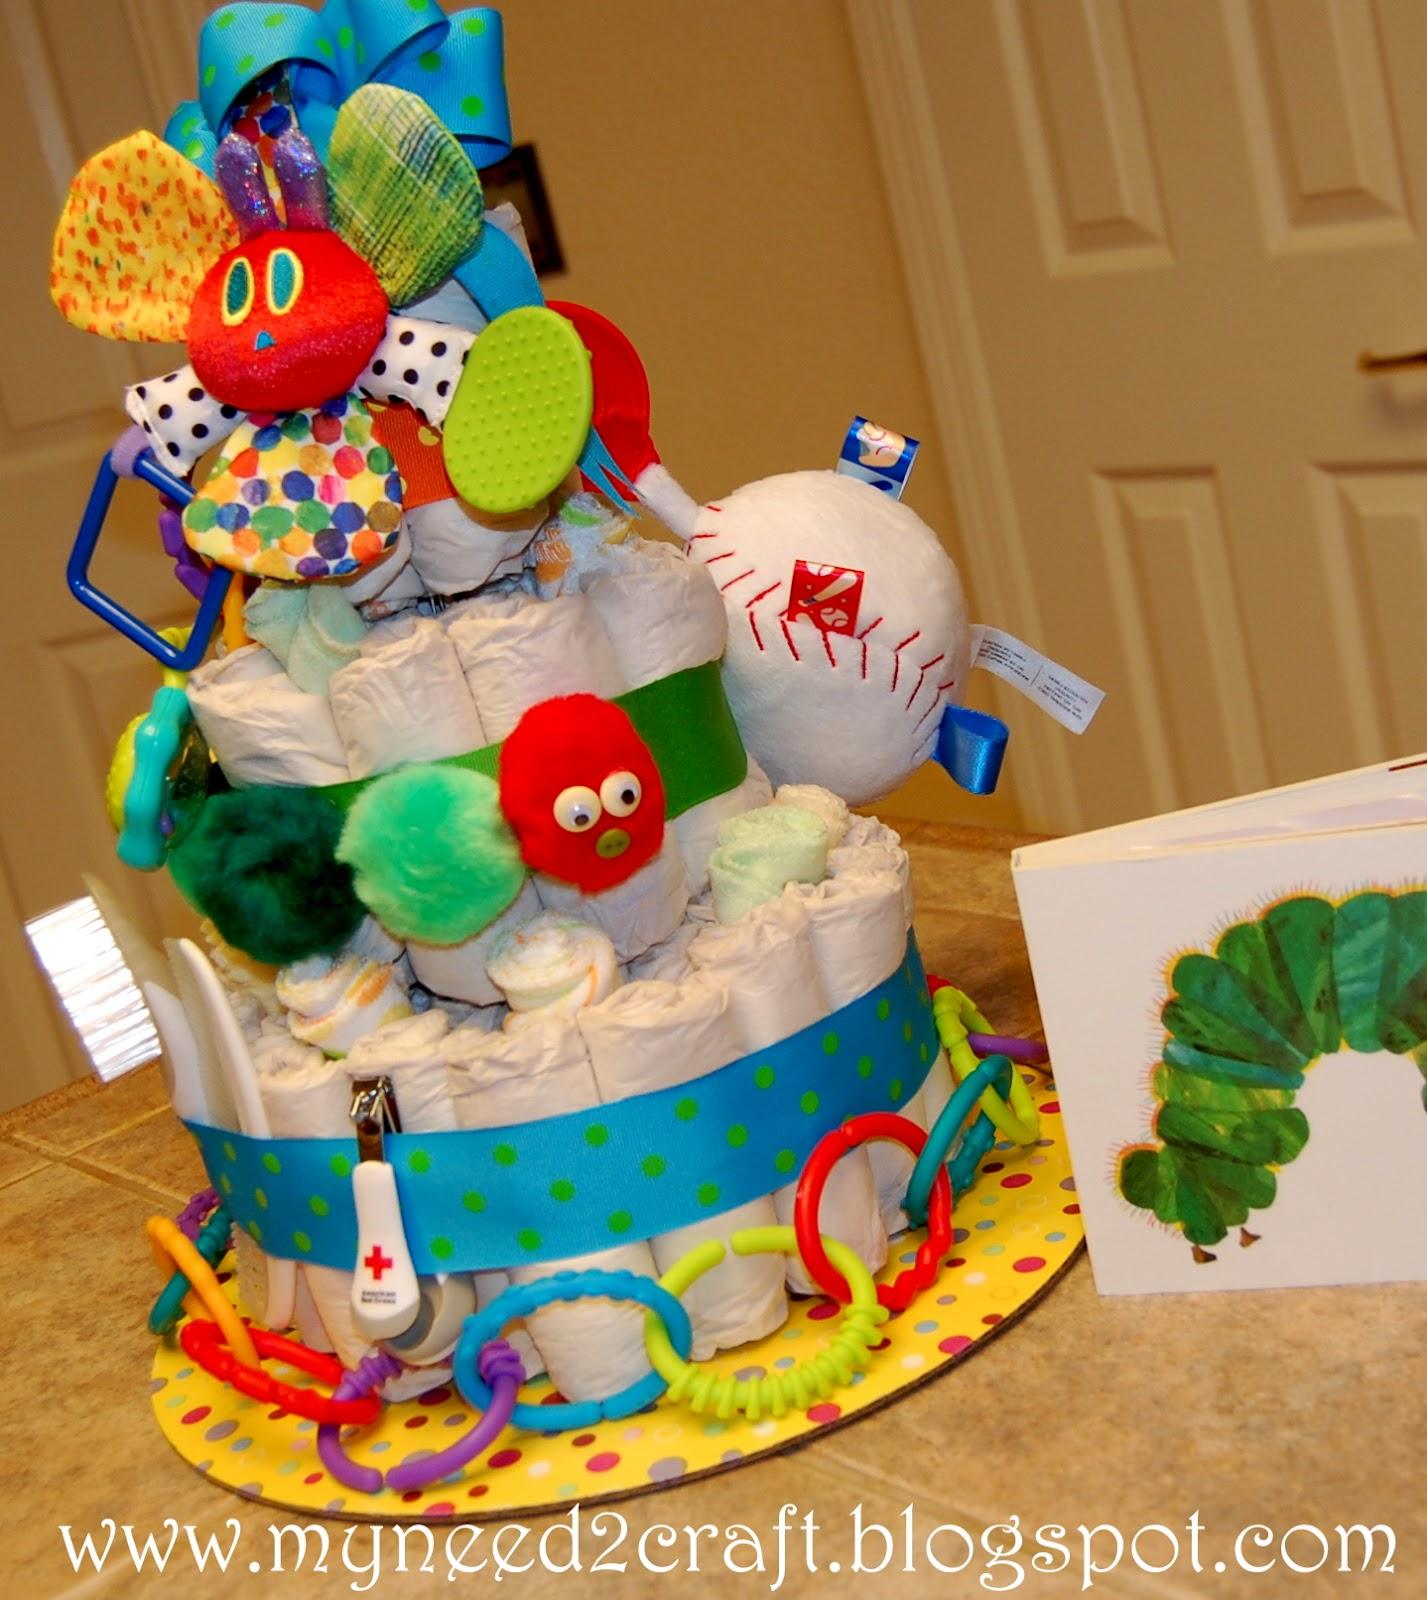 Myneed2craft Eric Carle Inspired Diaper Cake